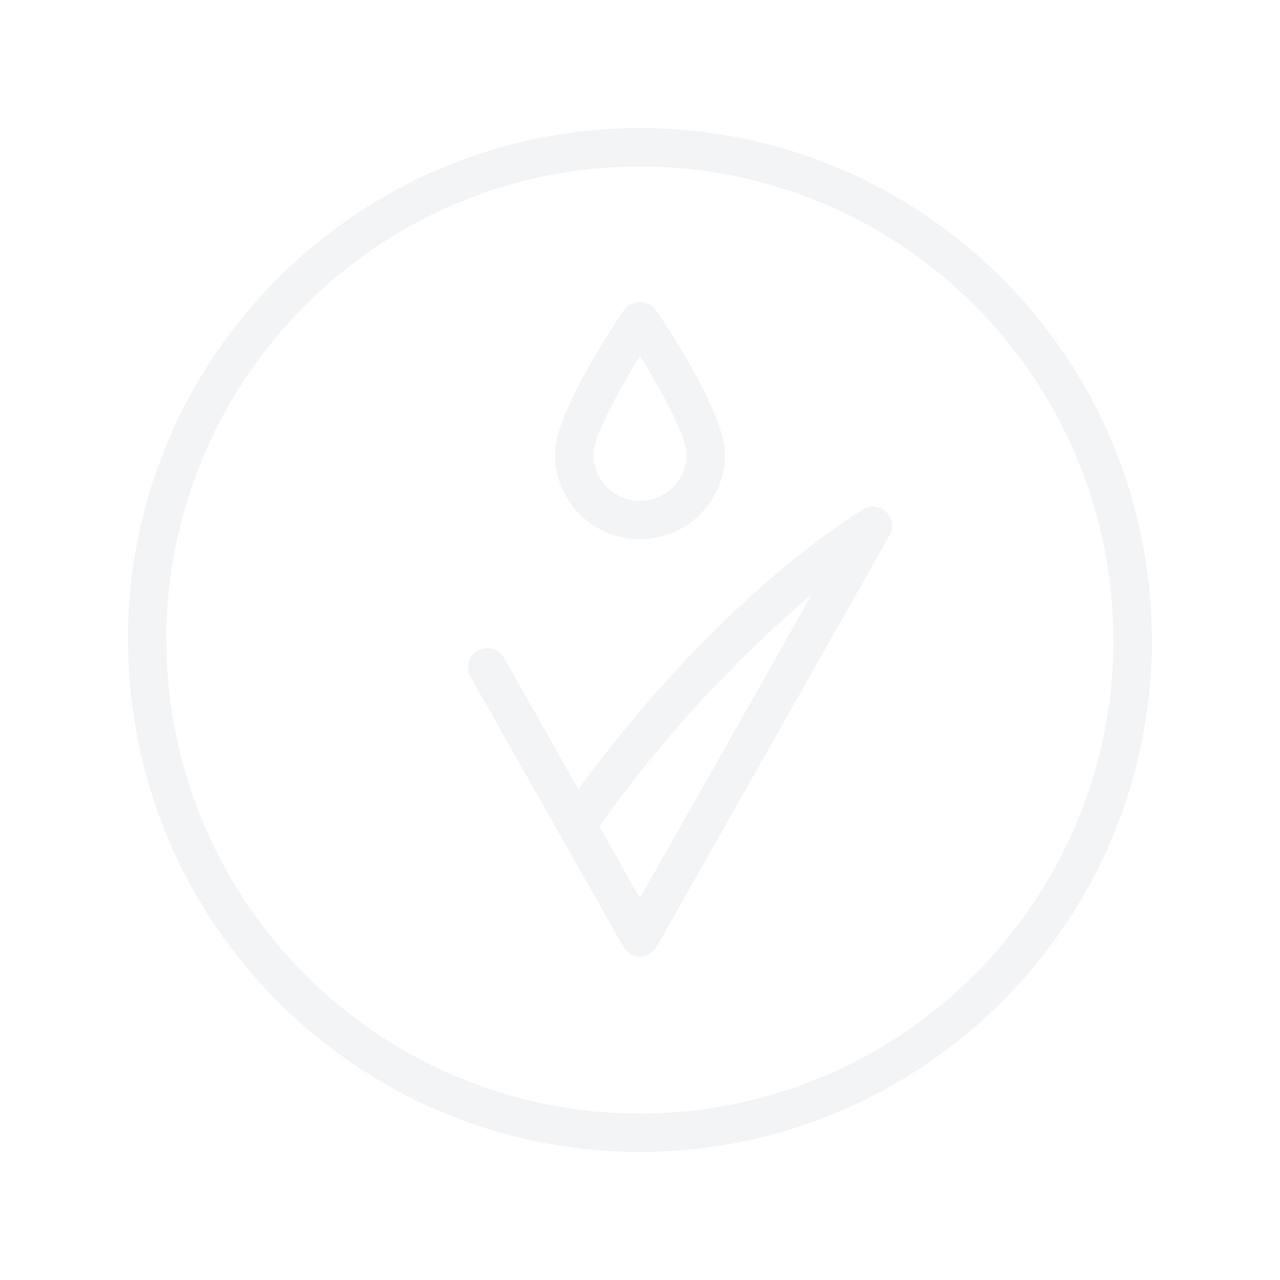 MIZON Joyful Time Essence Pomegranate Mask 23g маска для лица